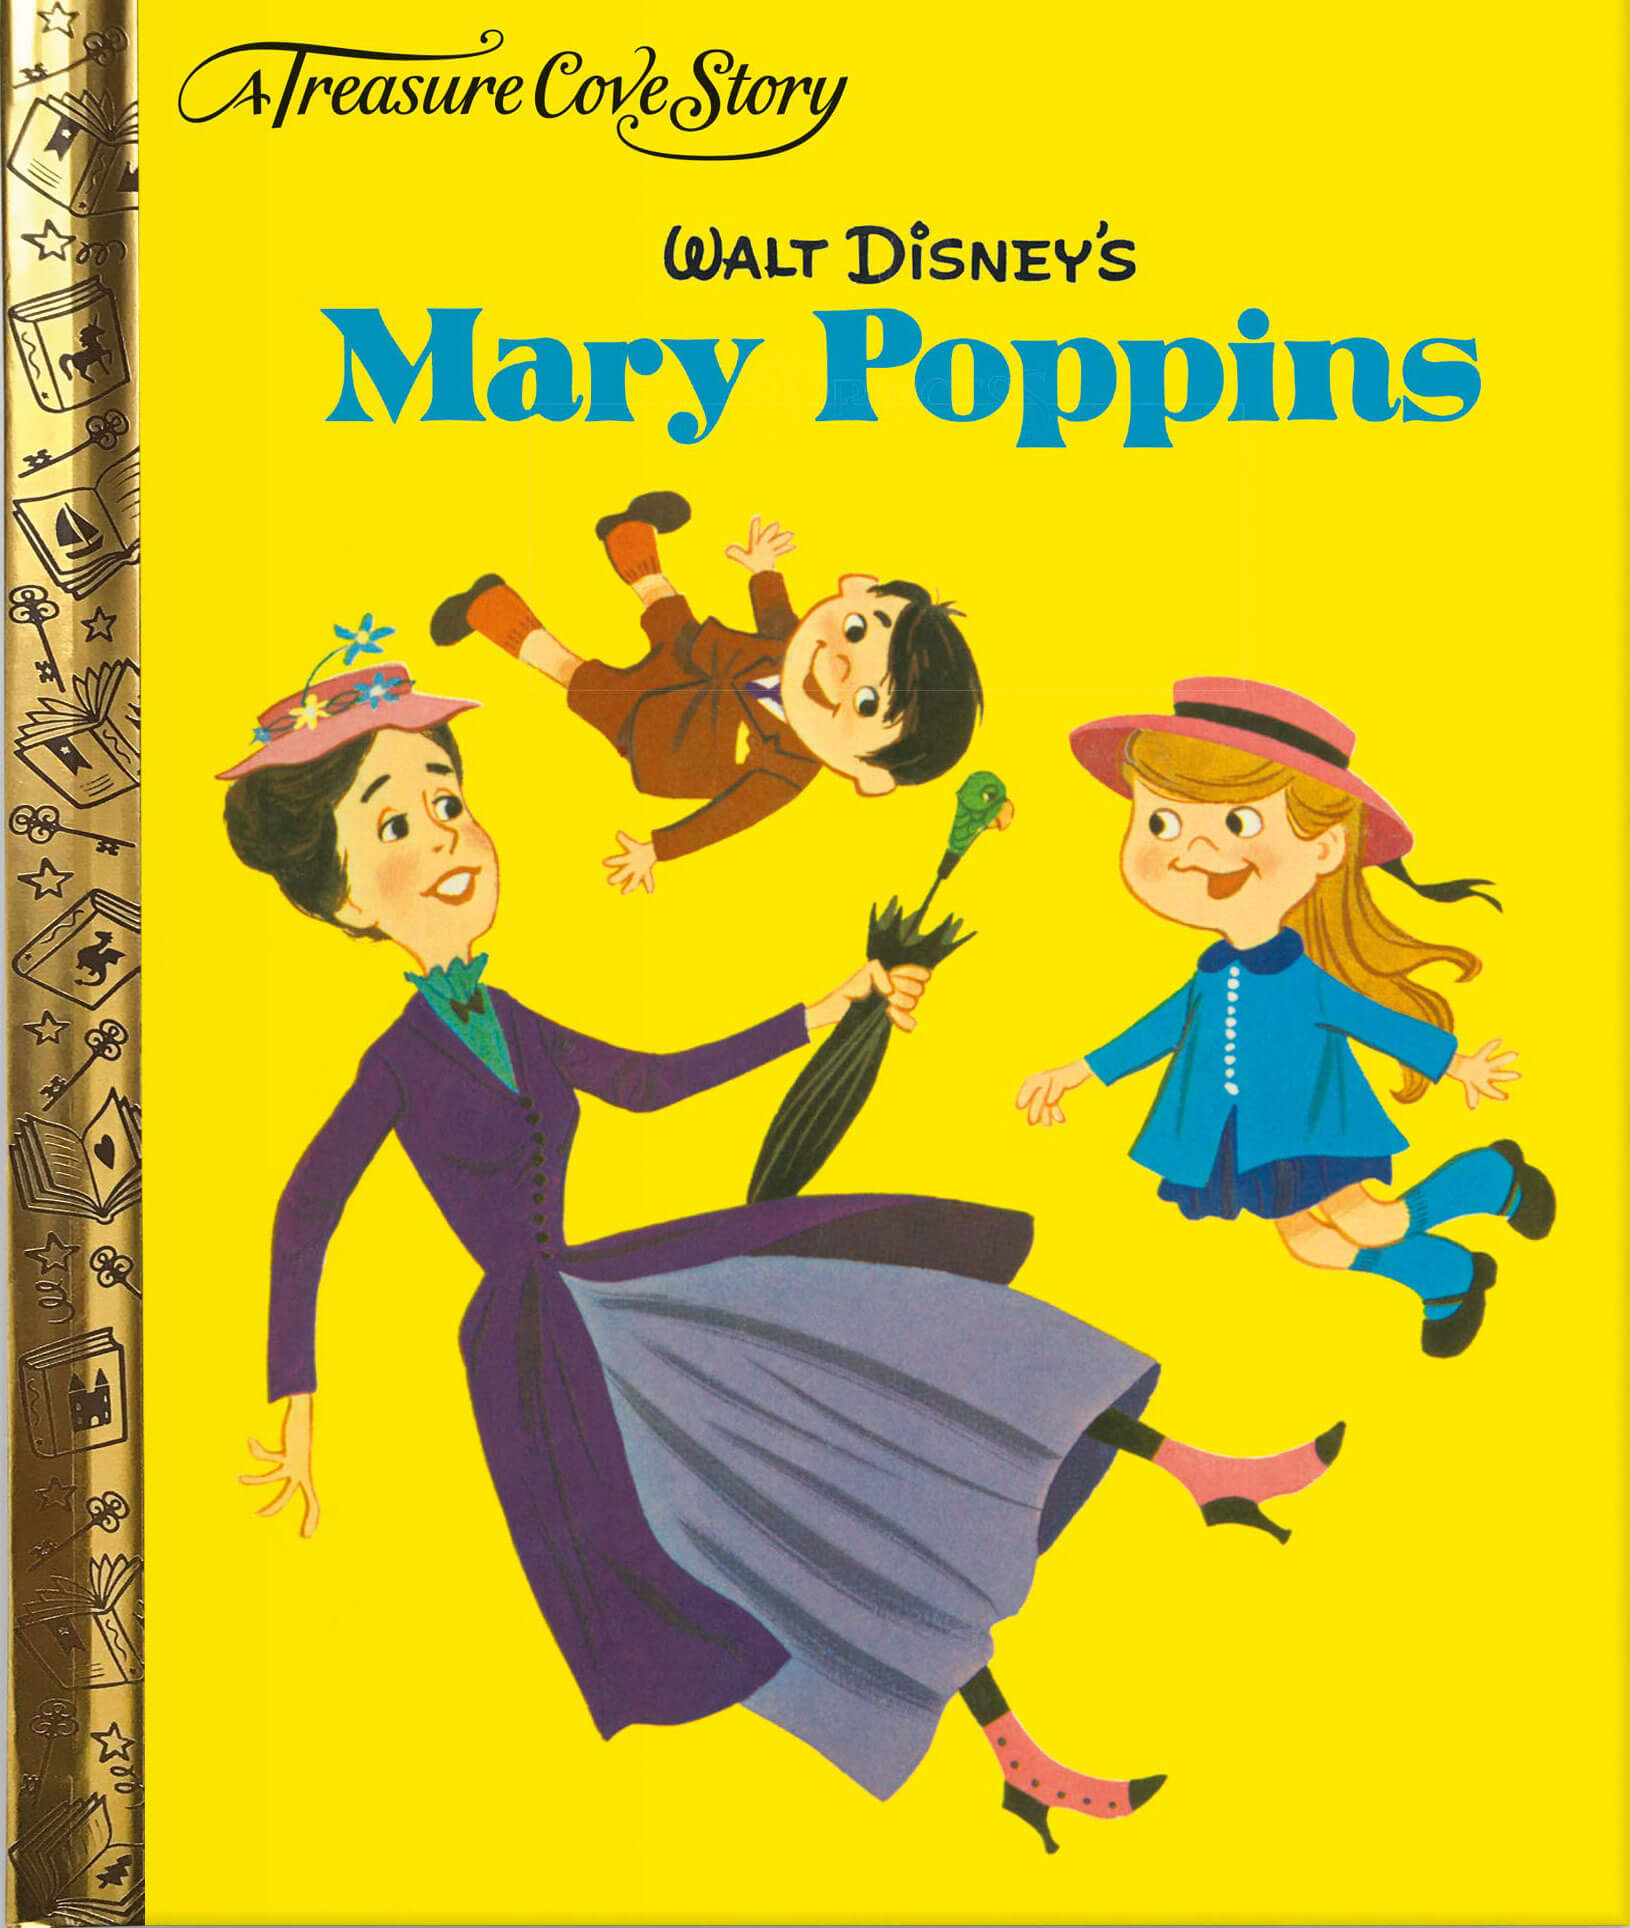 mary poppins treasure cove disney cover